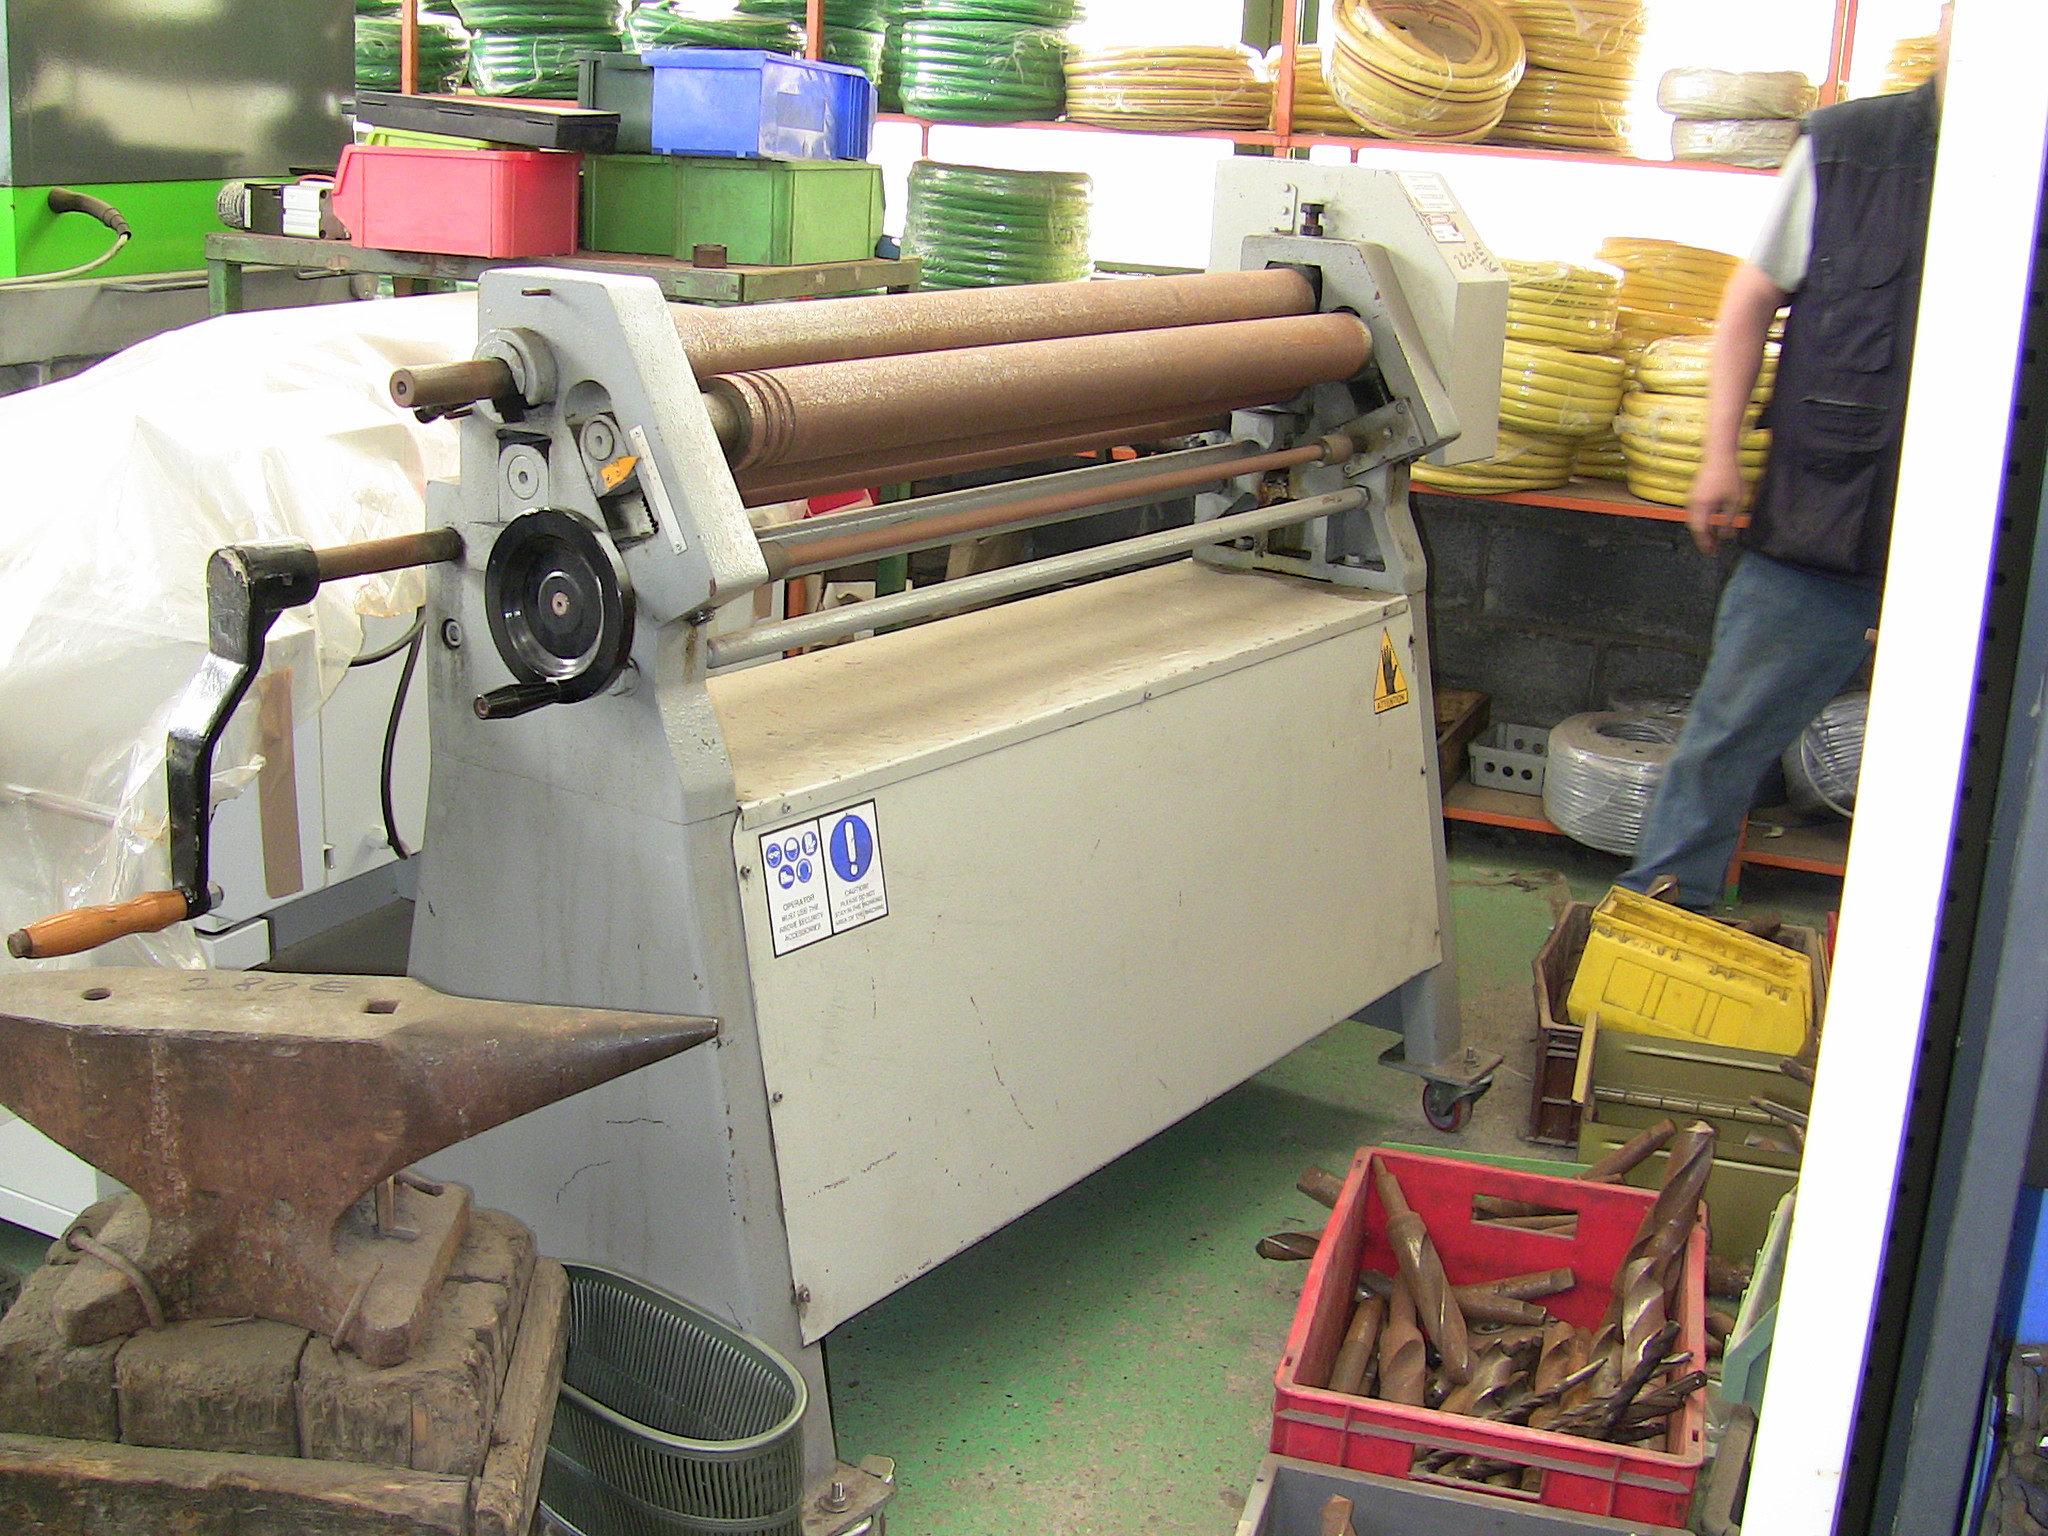 Bgf 61 brocante industrielle de glos la ferri re mobilier industriel - Brocante mobilier industriel ...